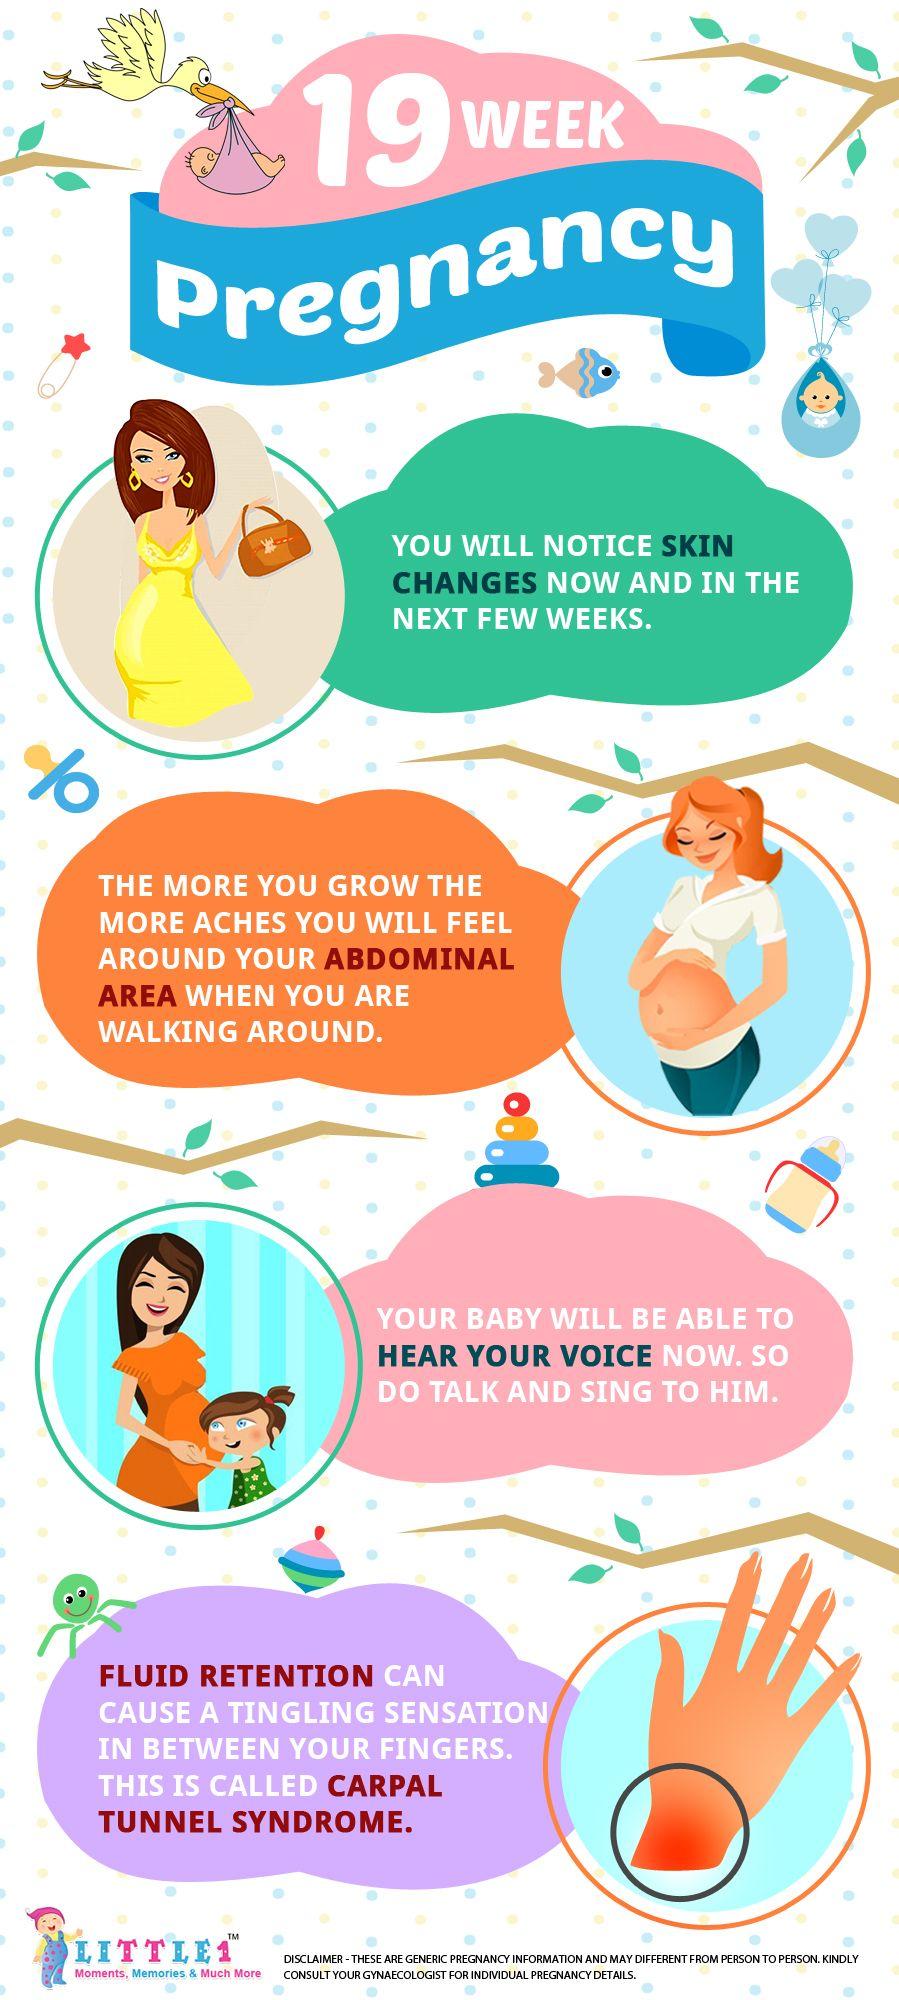 BabyCenter | Expert info for pregnancy & parenting